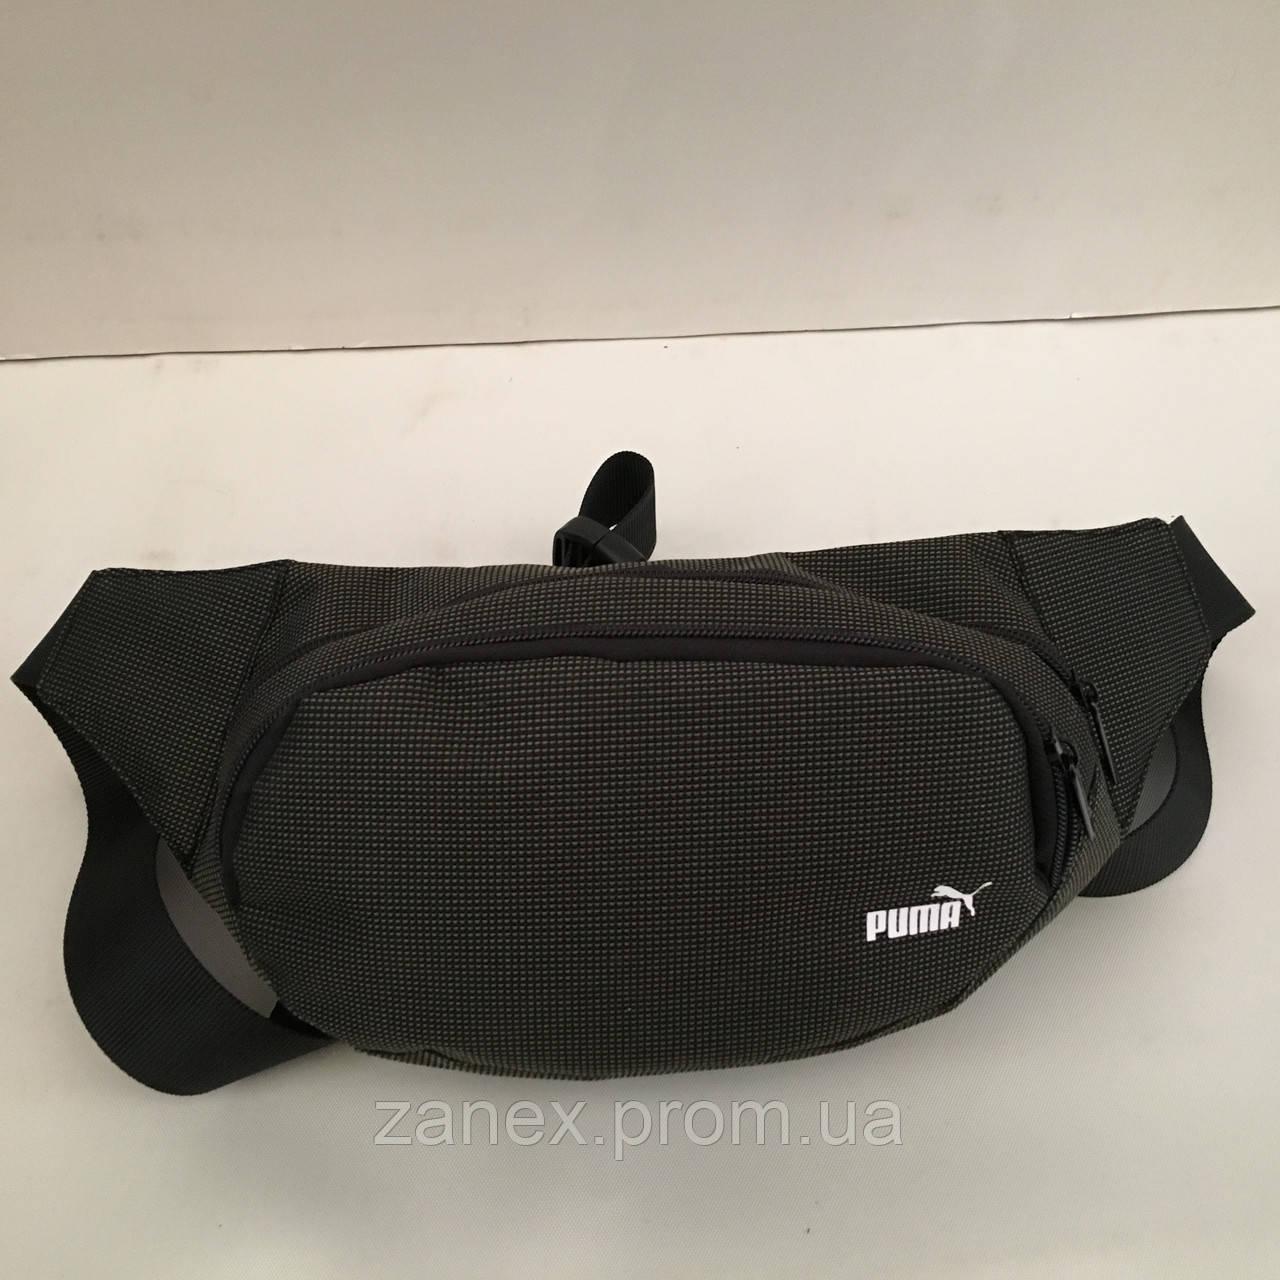 Поясная сумка черная Puma 2 отделения (Бананка, Сумка на пояс, сумка на плечо)